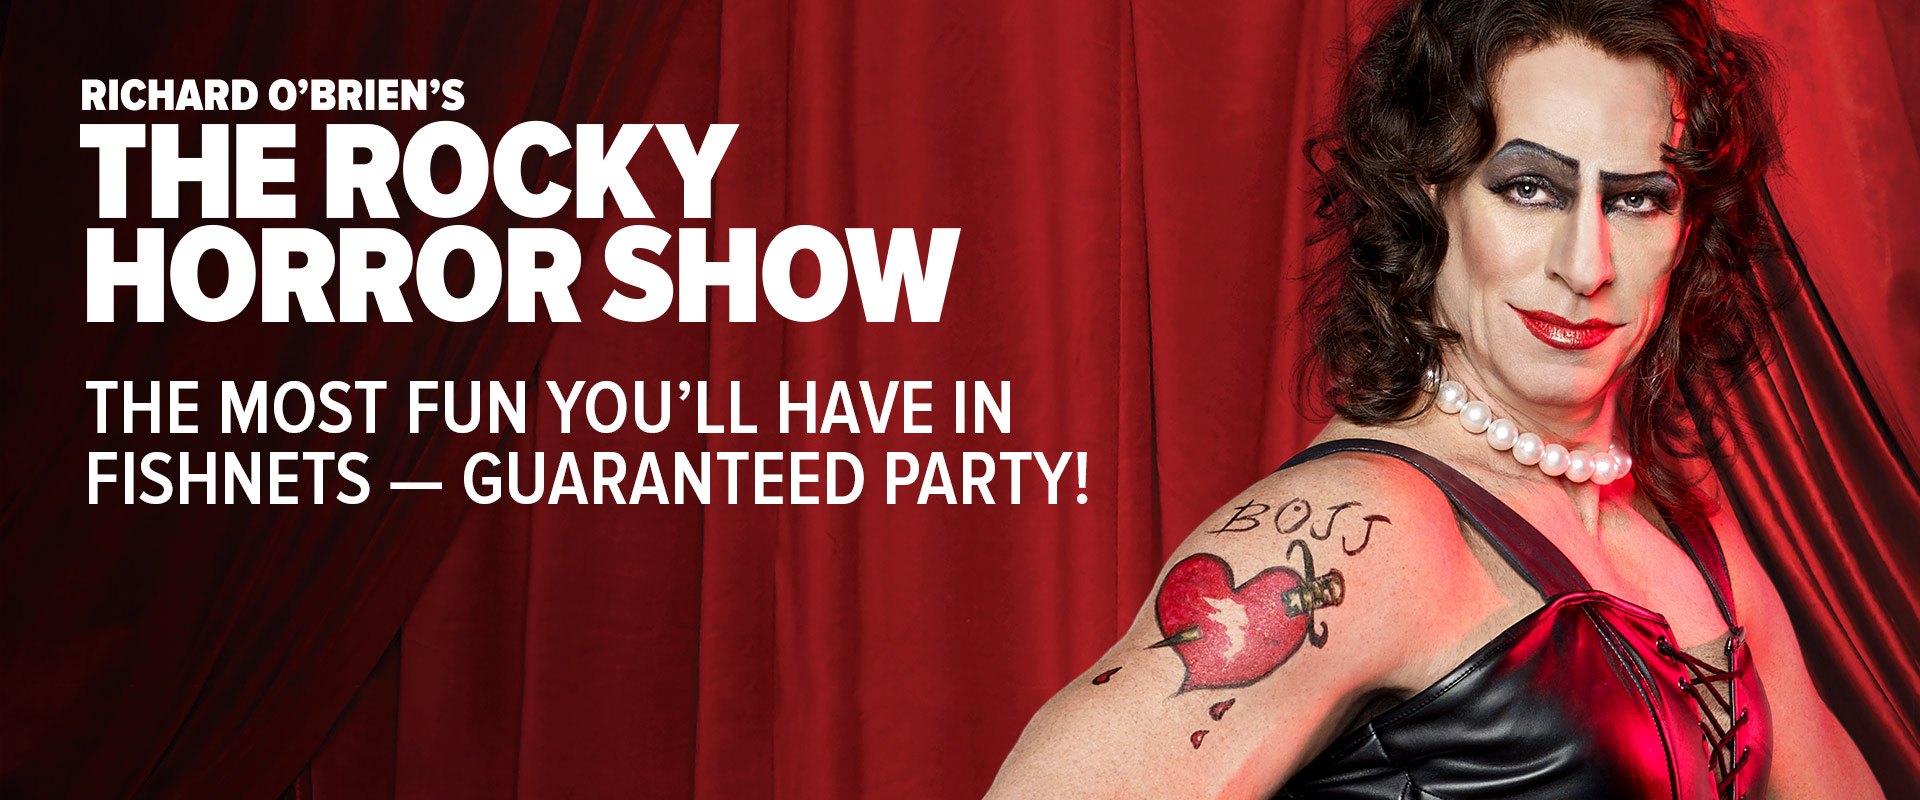 Rocky Horror Show Publicity Image